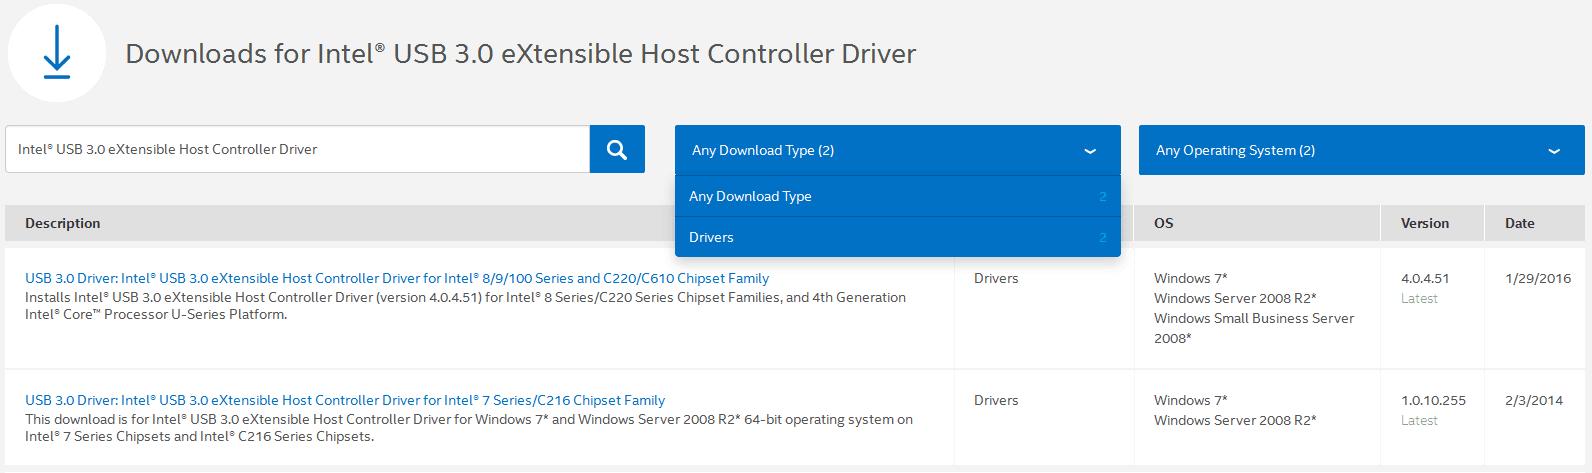 Intel Usb 30 Extensible Host Controller Driver Windows 10 - d0wnloadside